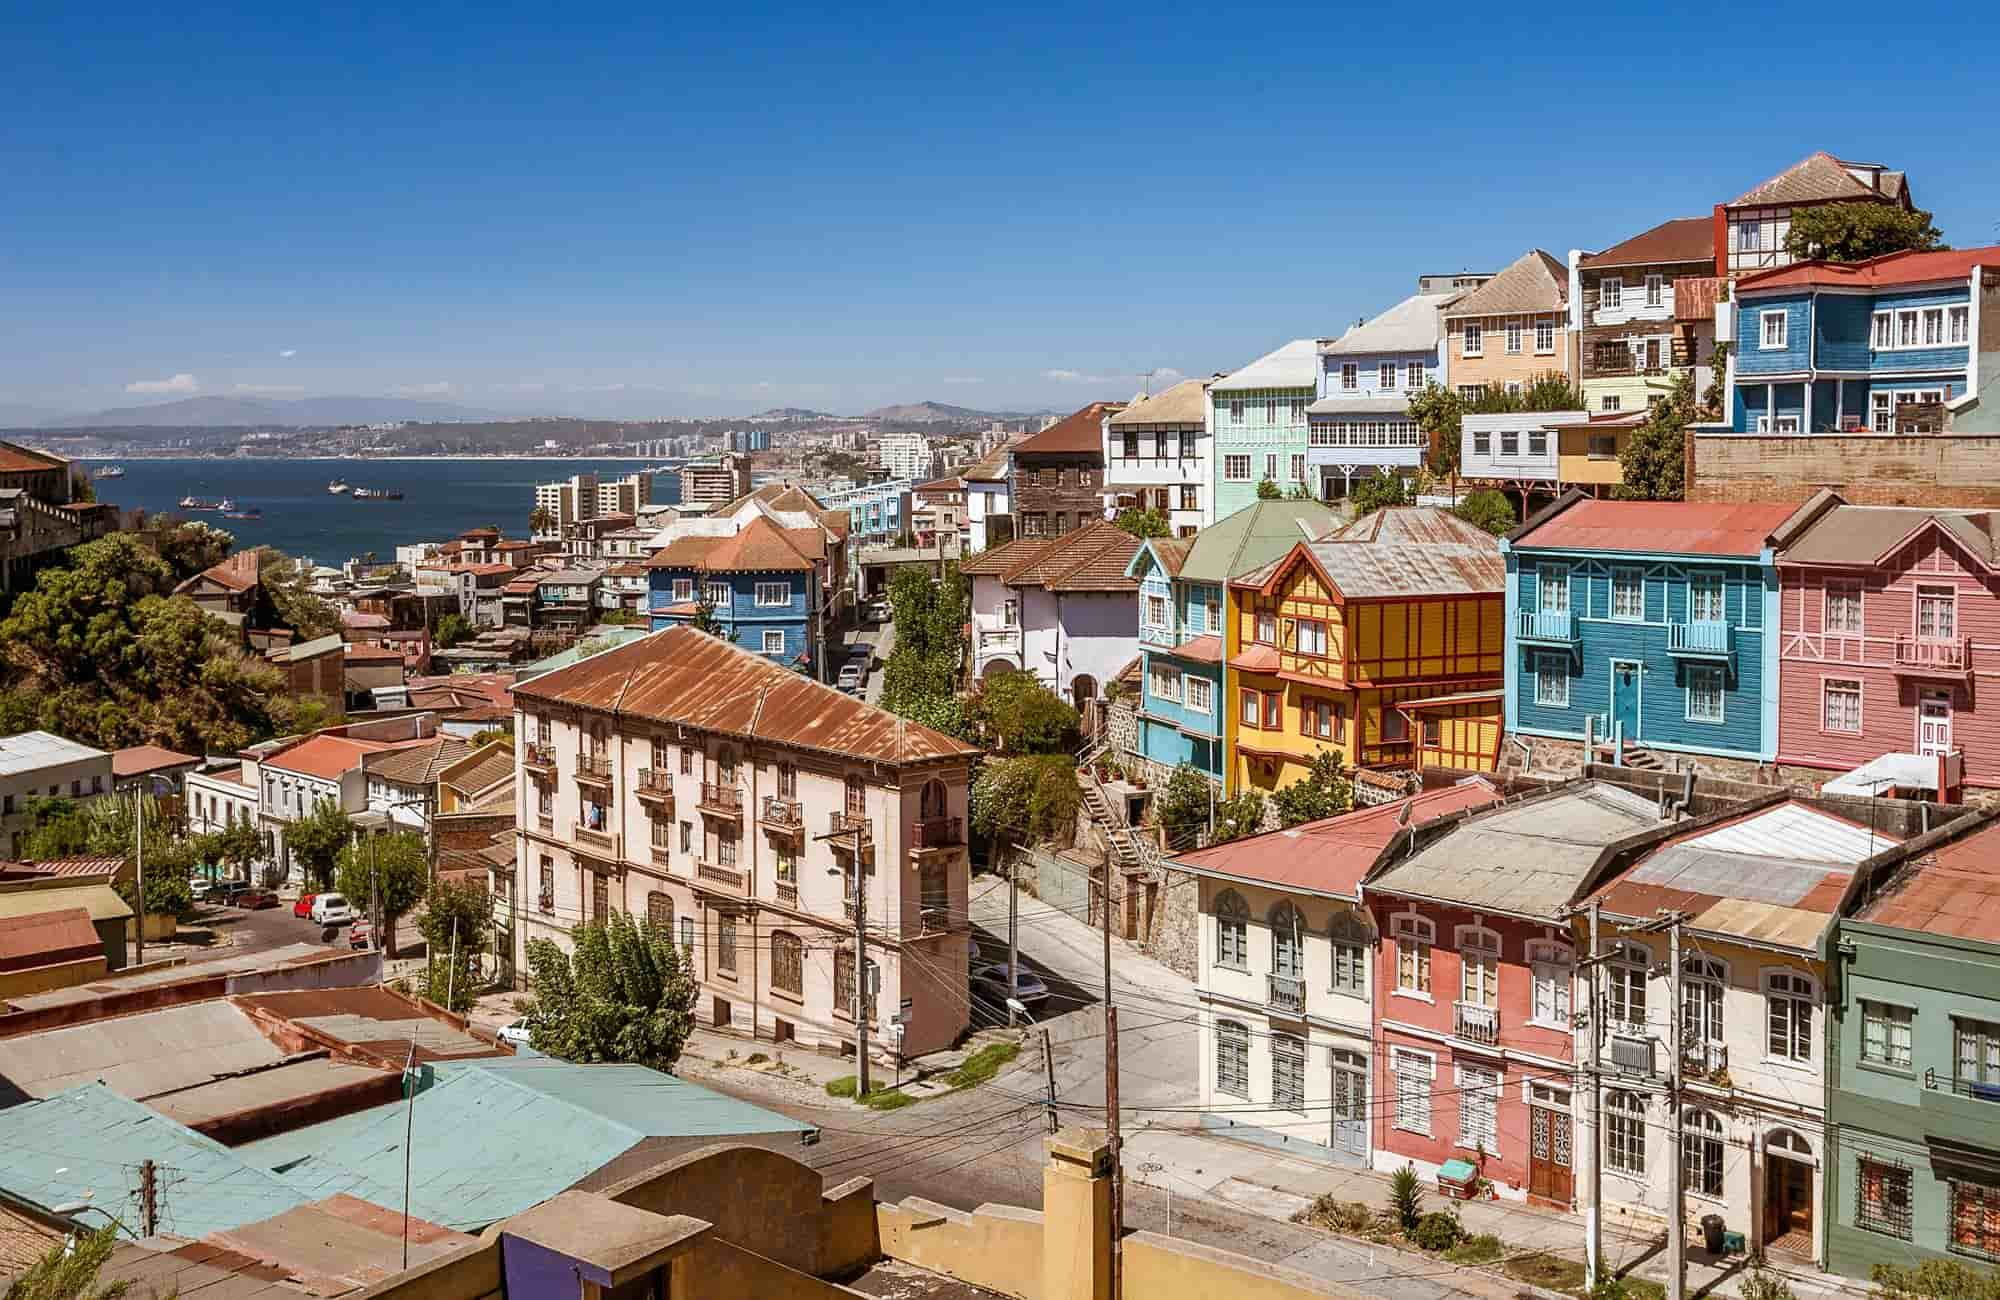 Voyage au Chili - Valparaiso - Amplitudes